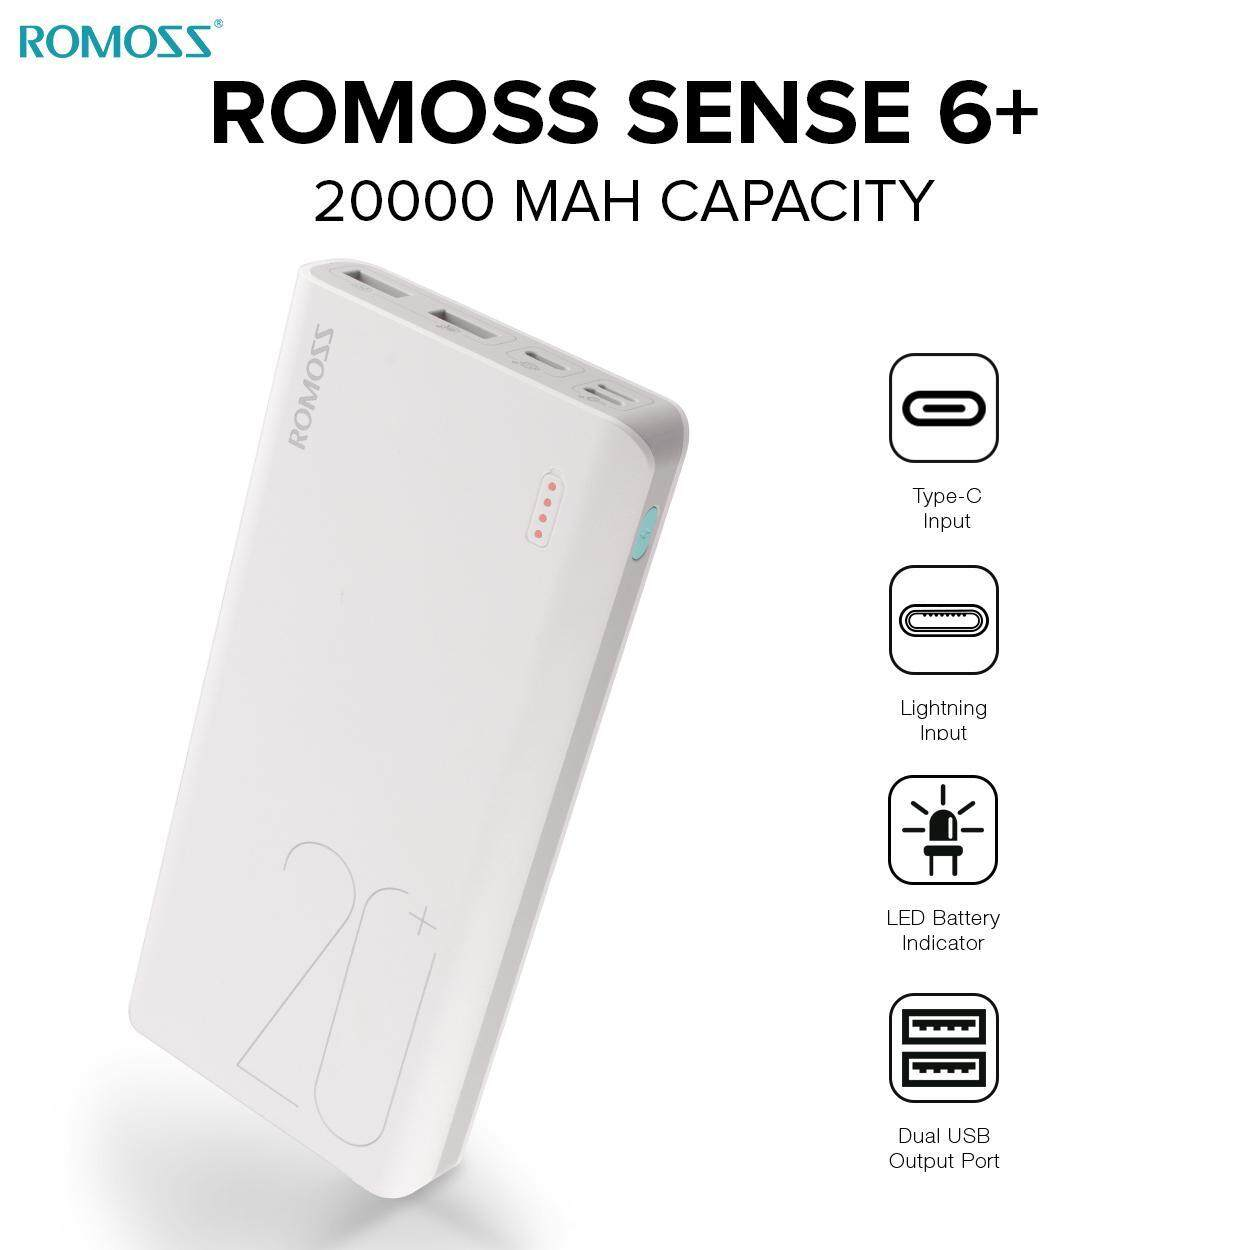 ROMOSS SENSE 6 PLUS/sense 6 20000mAh POWER BANK RM-PH80C0202 (WHITE)